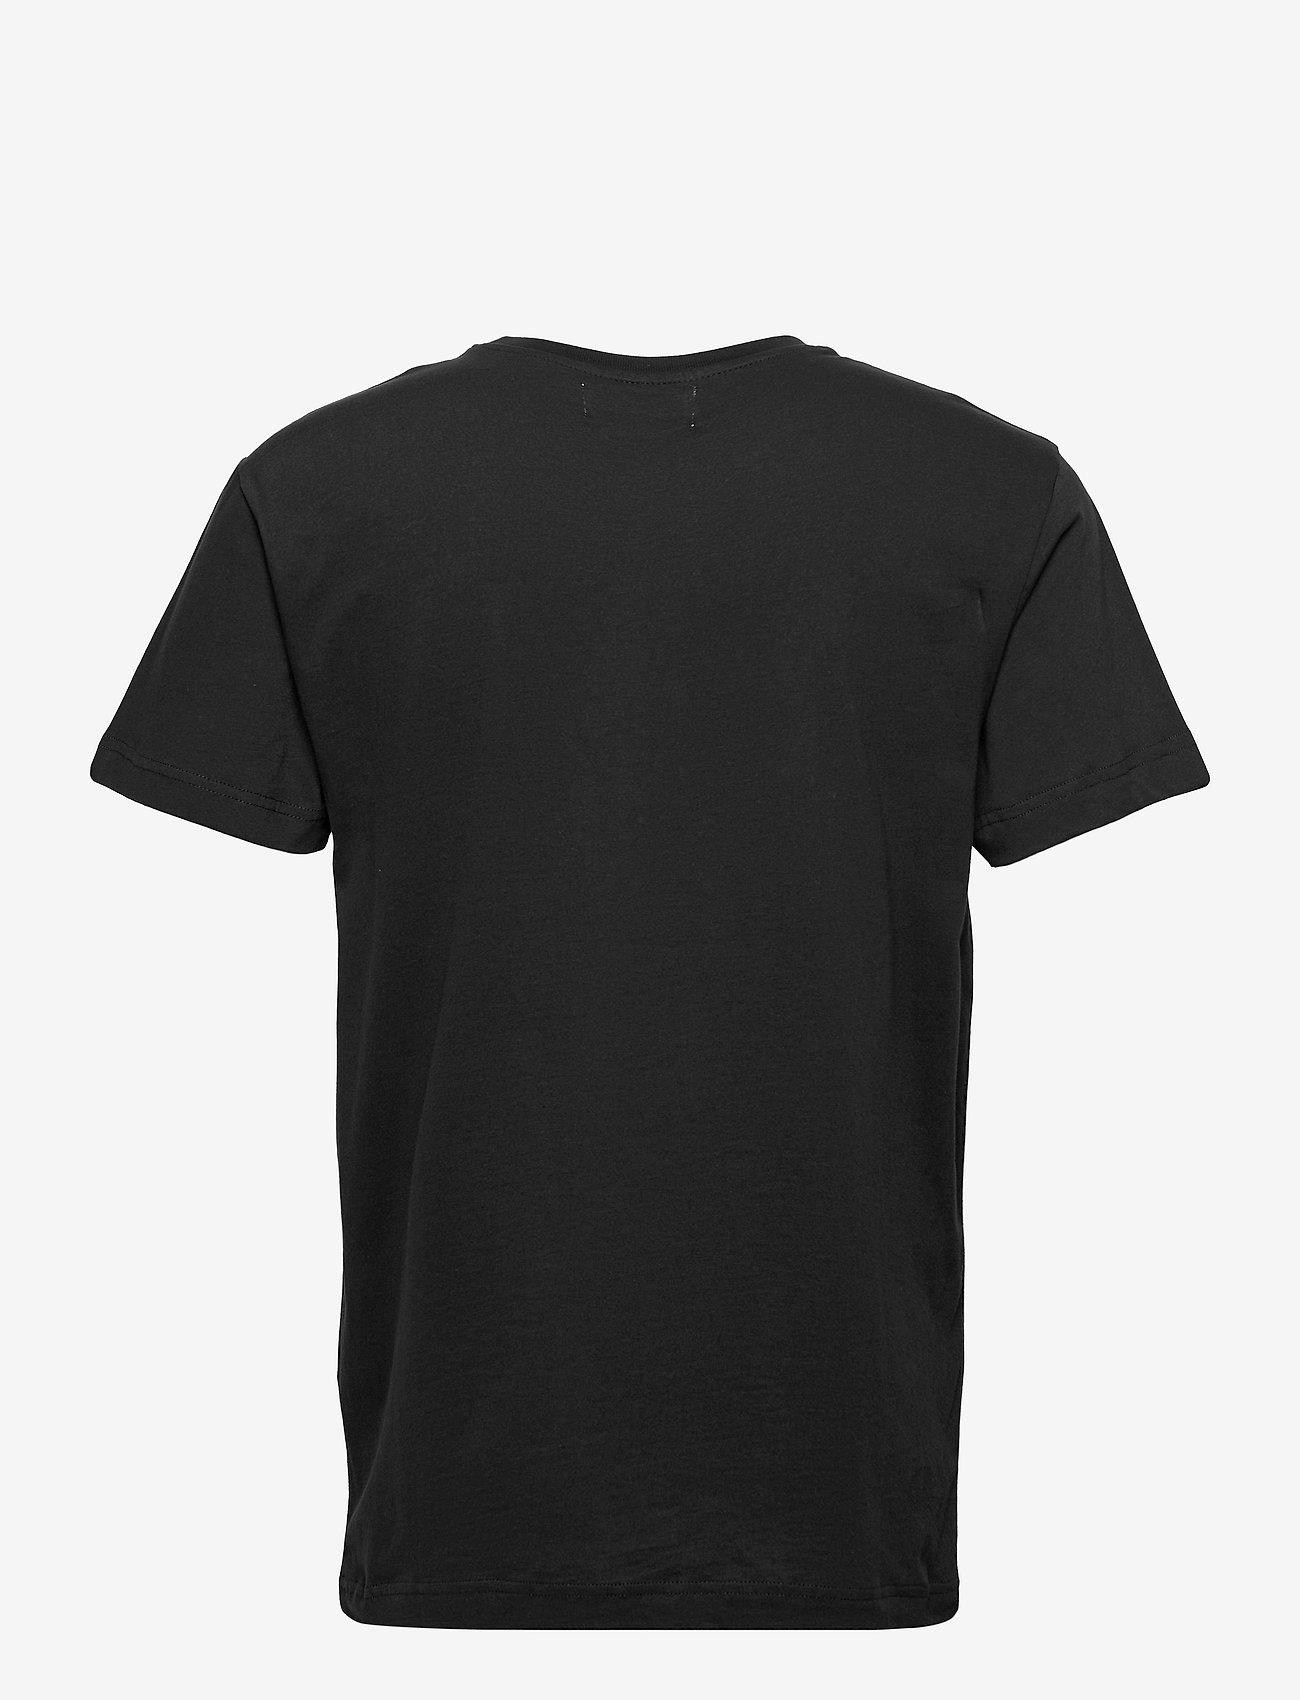 Libertine-Libertine - Beat L-L - basic t-shirts - black - 1